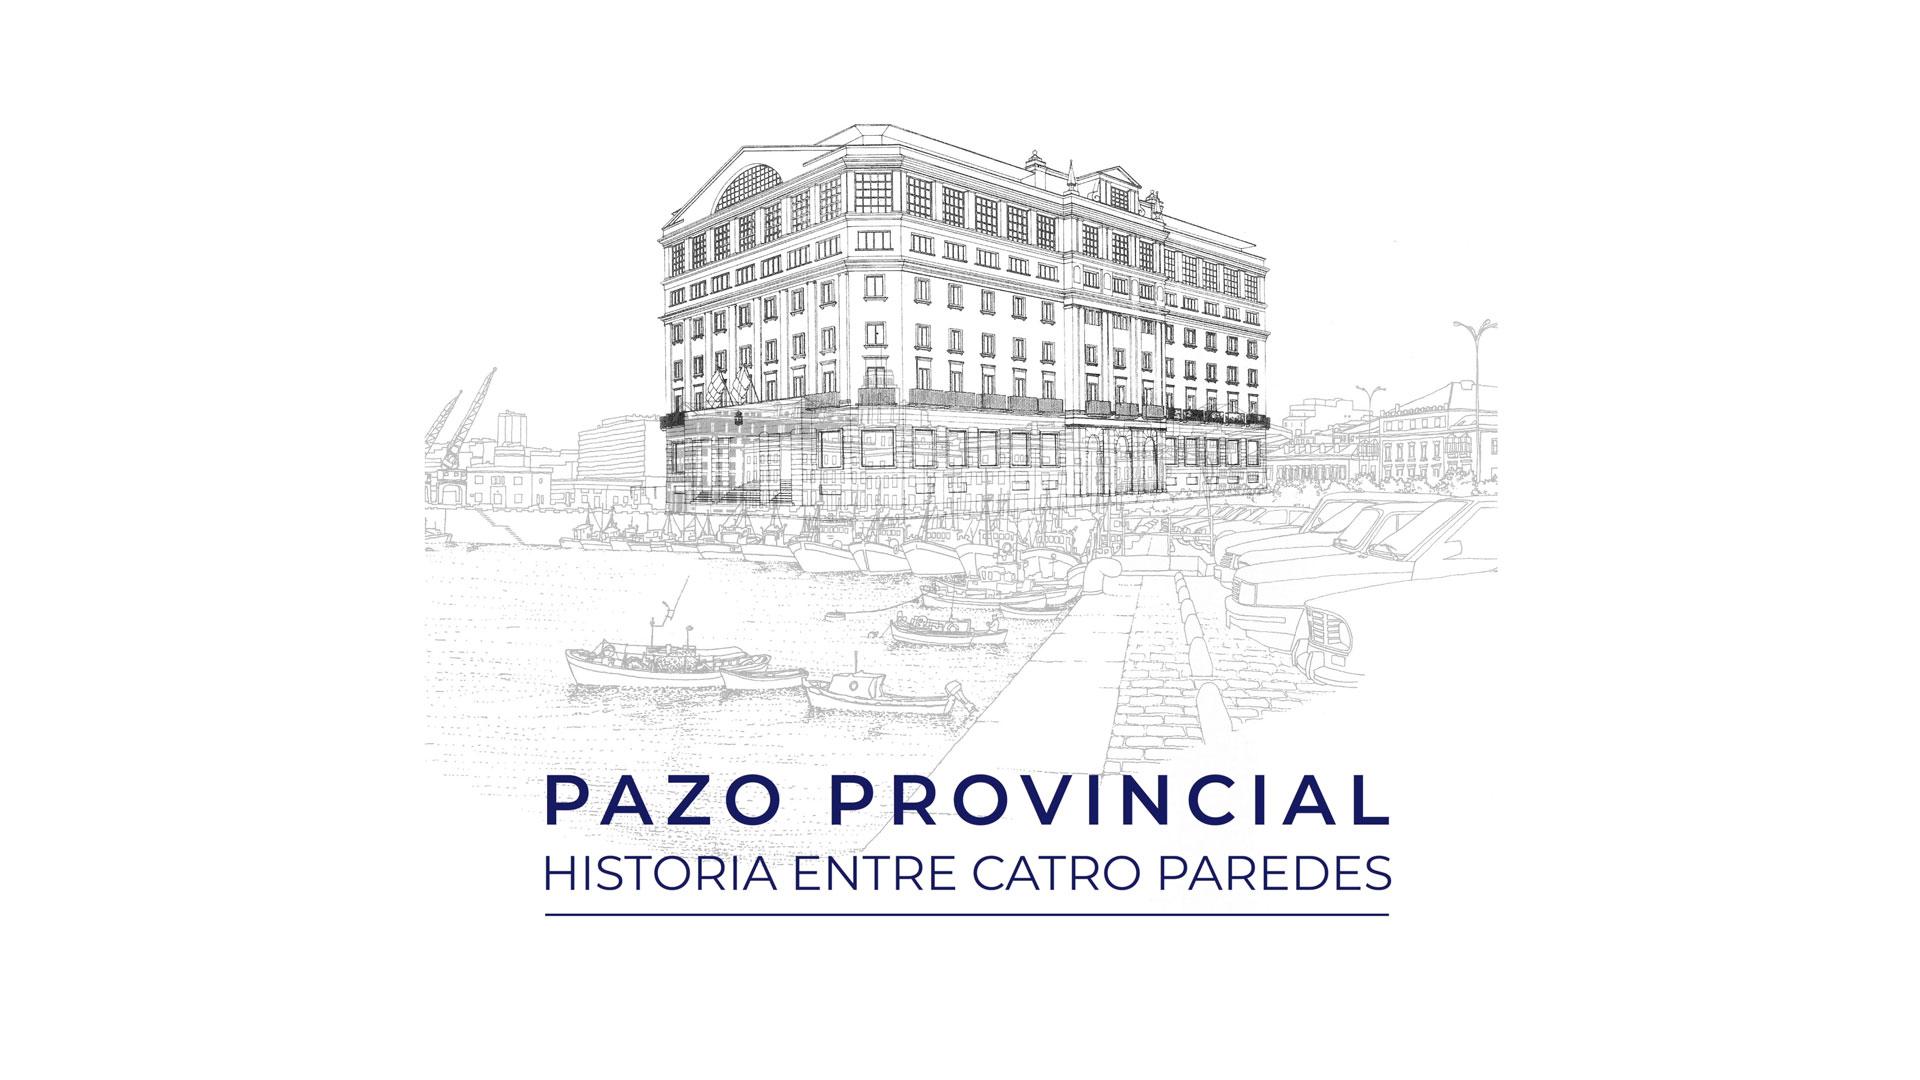 Pazo provincial, historia entre catro paredes